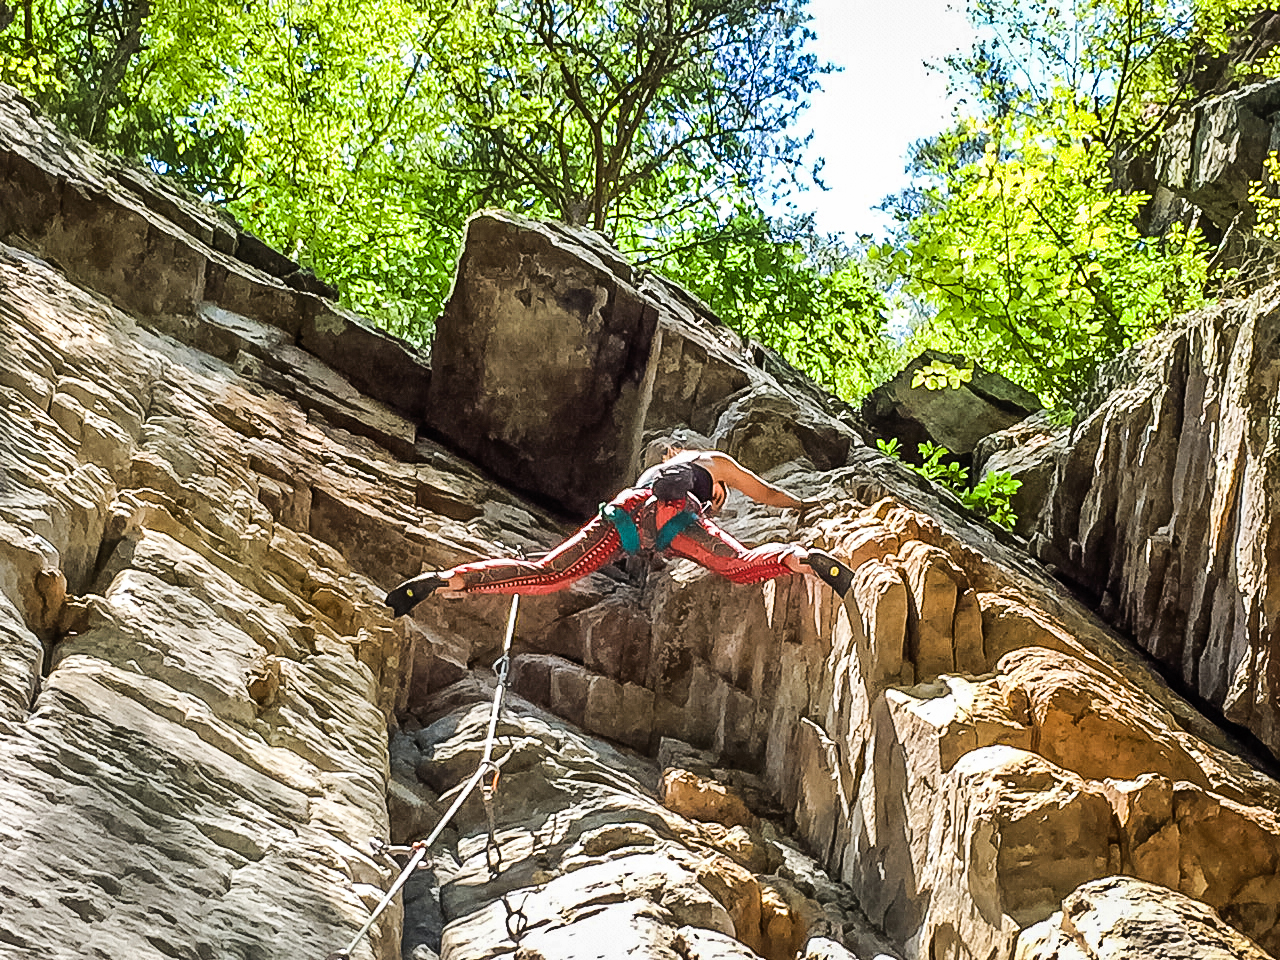 Raisa climbing Aloha (5.9) in Franklin Gorge, West Virginia